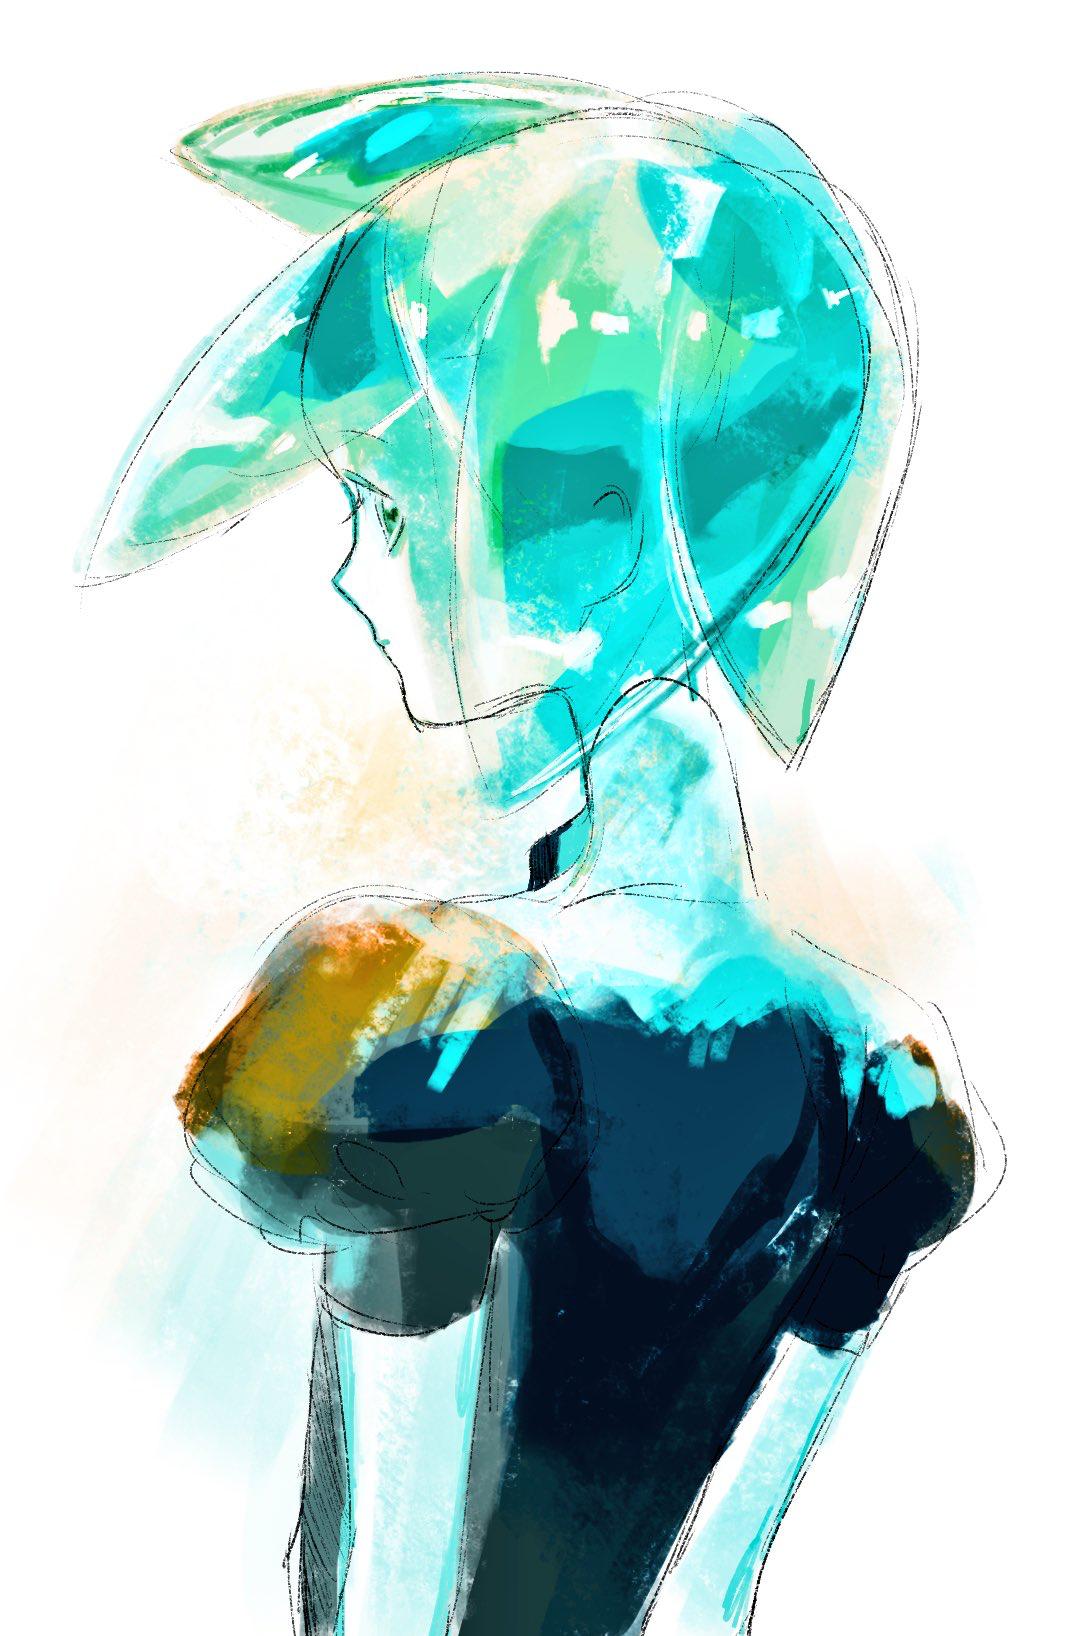 Pin by anilyan on houseki no kuni pinterest anime simple cartoon and kawaii anime girl